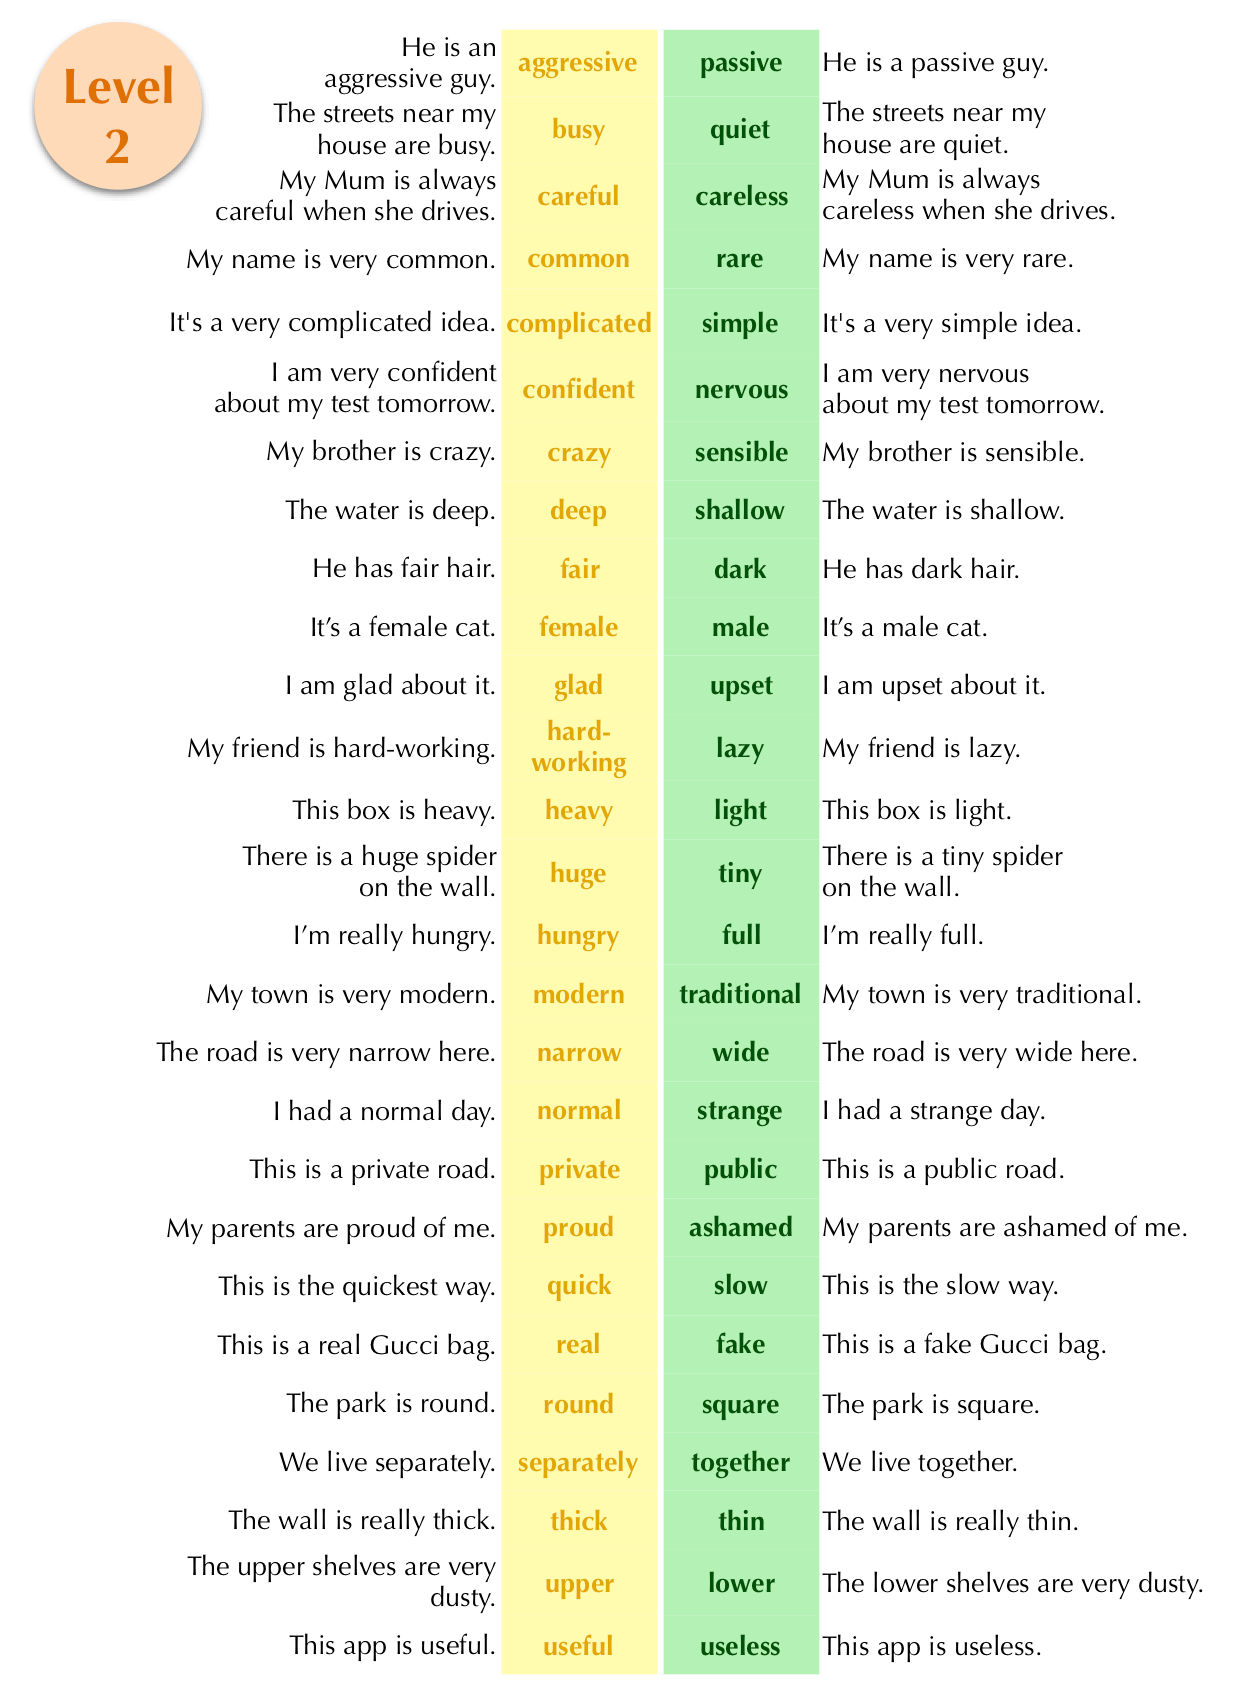 74 Grammar Tenses List Printable Hd Docx